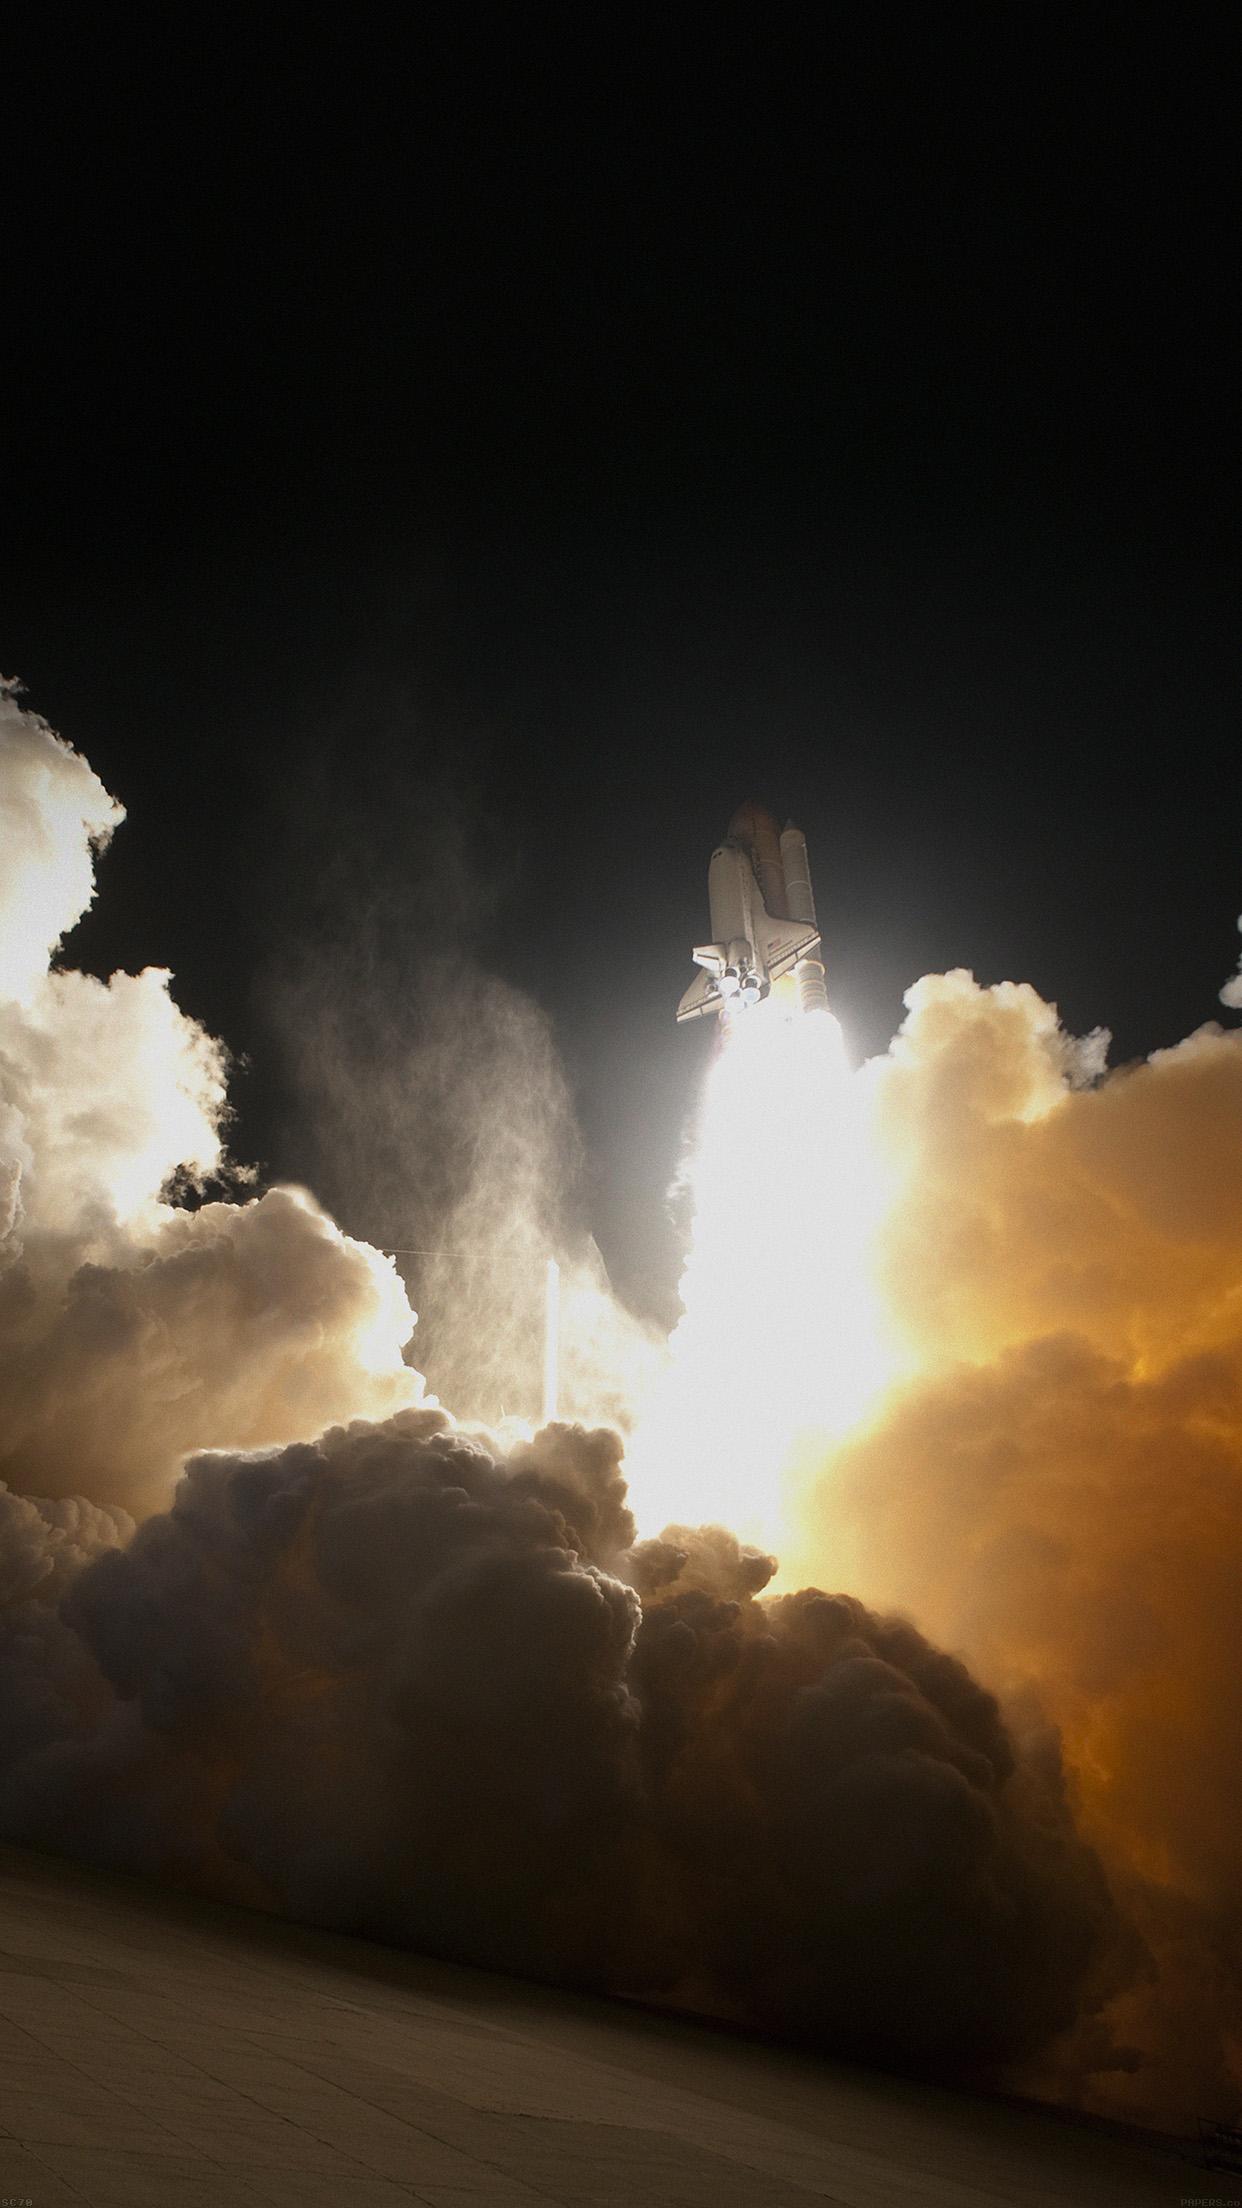 Mi23-space-shuttle-nasa-to-space